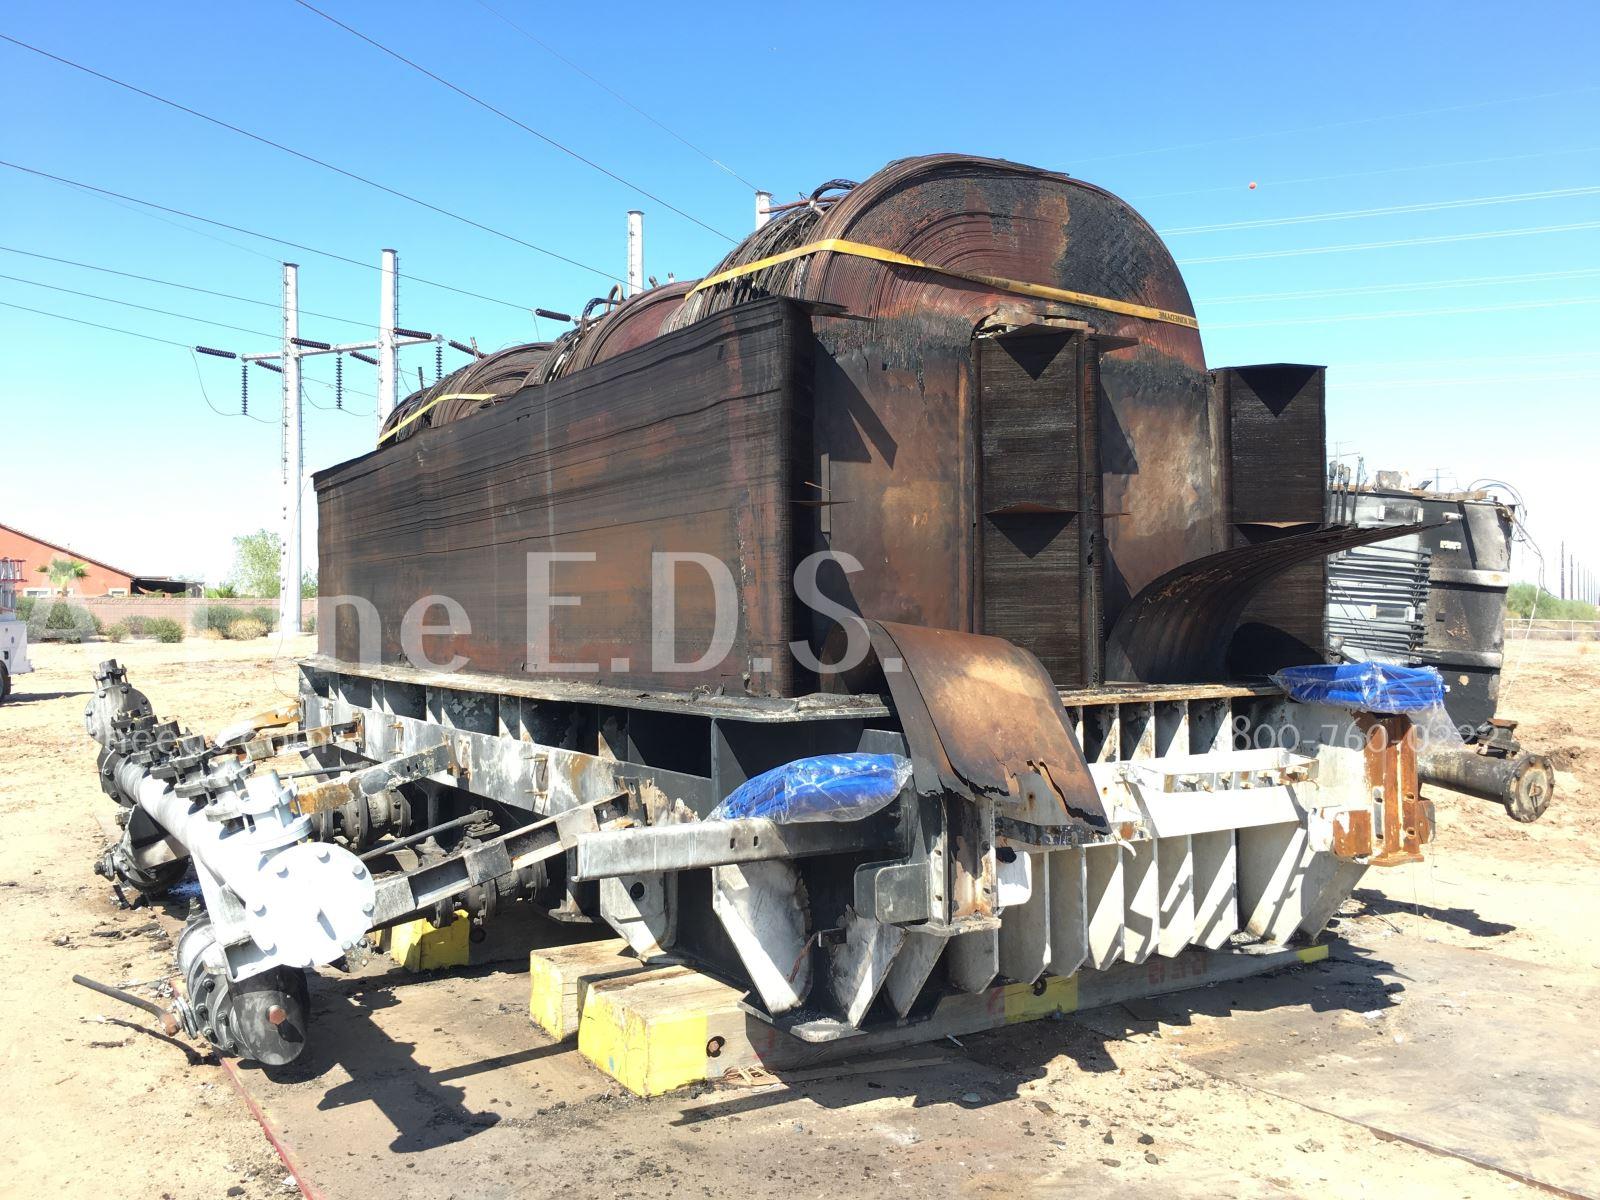 Power Transformer Failures- The Dirty Jobs - A-Line | E D S